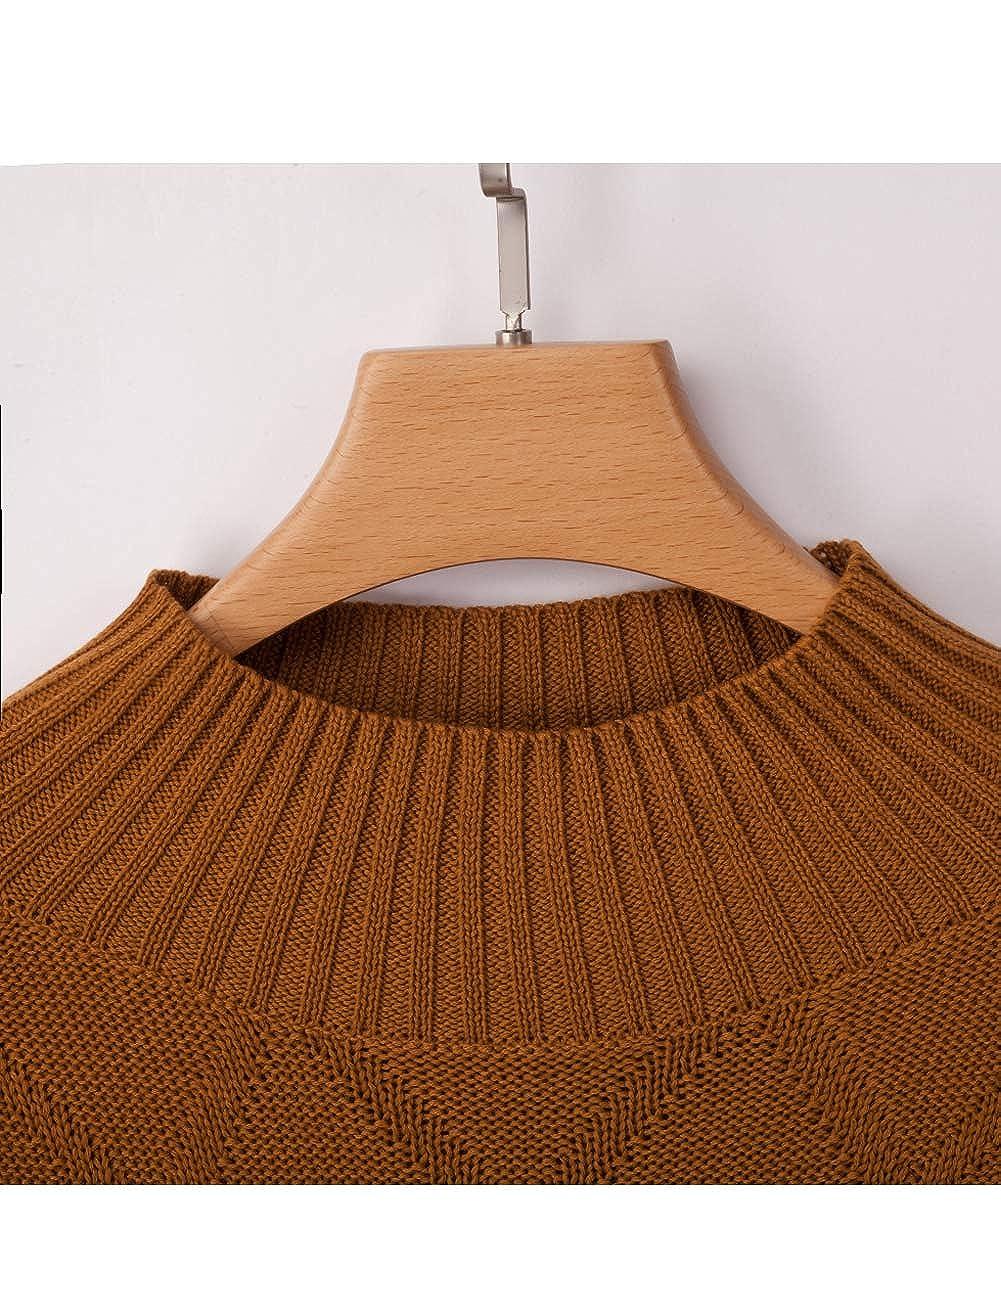 Bibowa Women Mock Turtleneck Sweater Slouchy Sweater Baggy Oversized Comfy Pullover